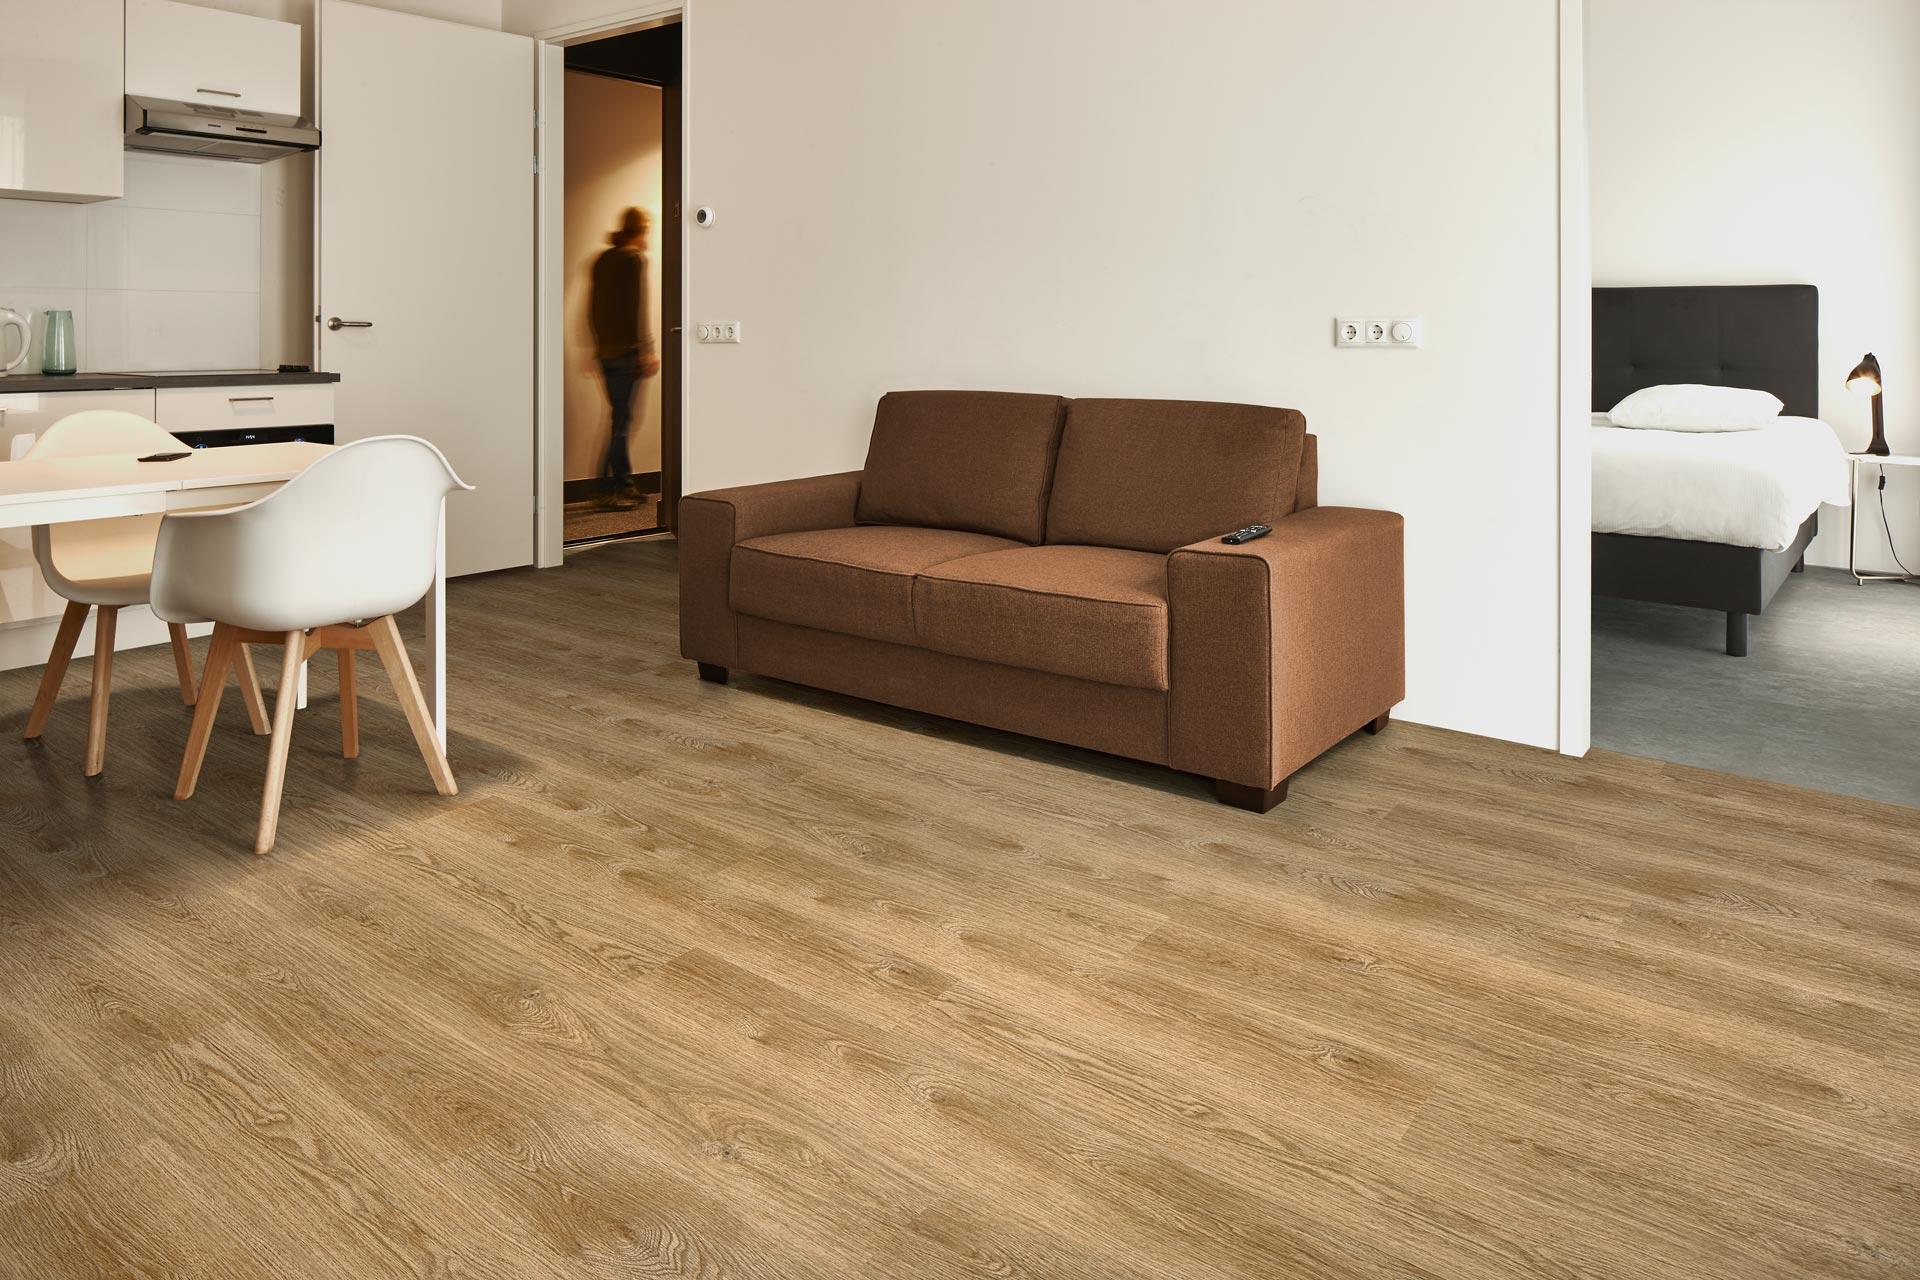 Vinylboden Pure Oak – Jetzt kostenloses Muster bestellen!